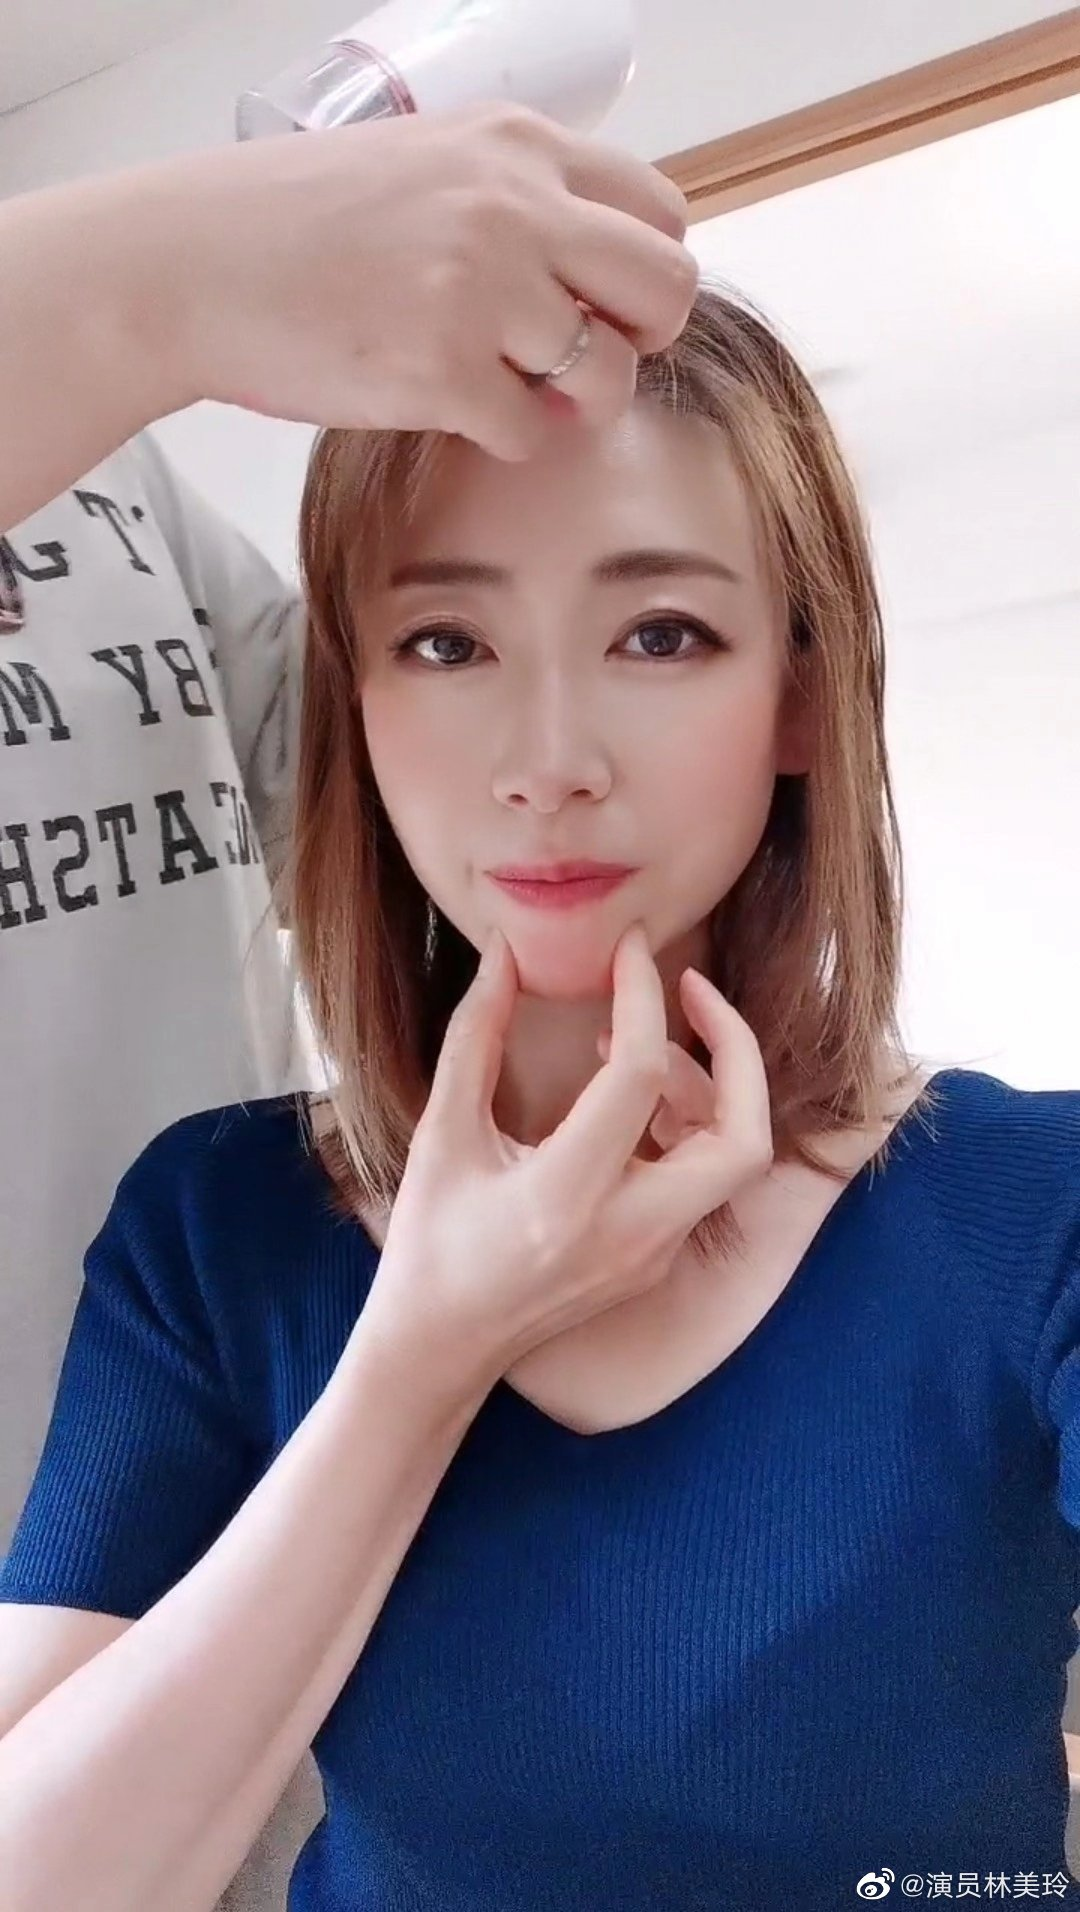 A~V演员林美玲开微博了插图